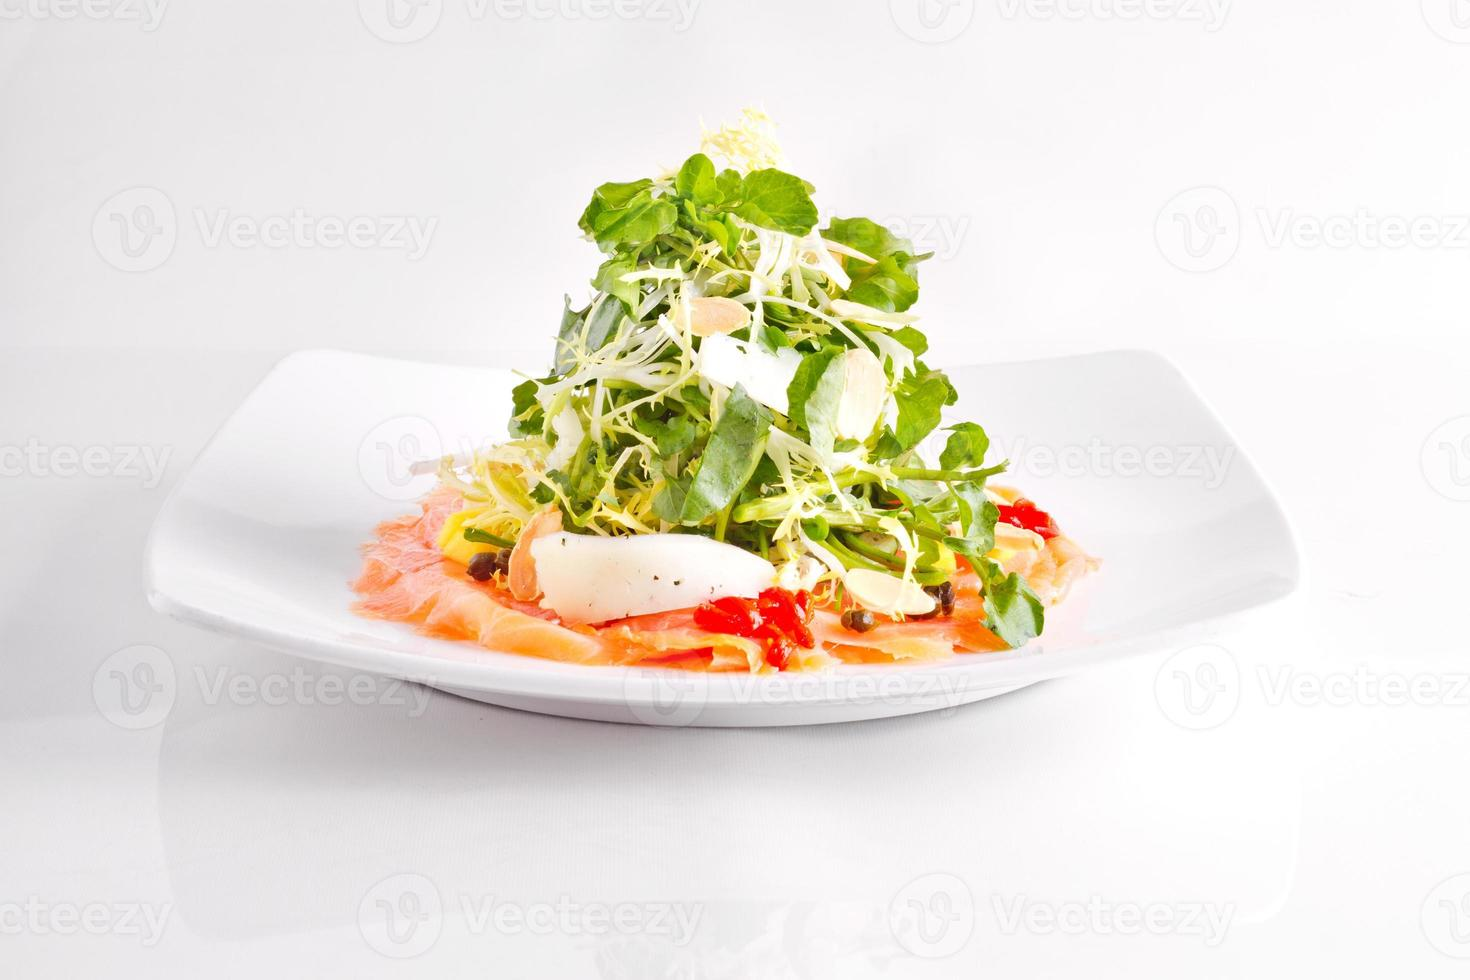 voedsel menu foto